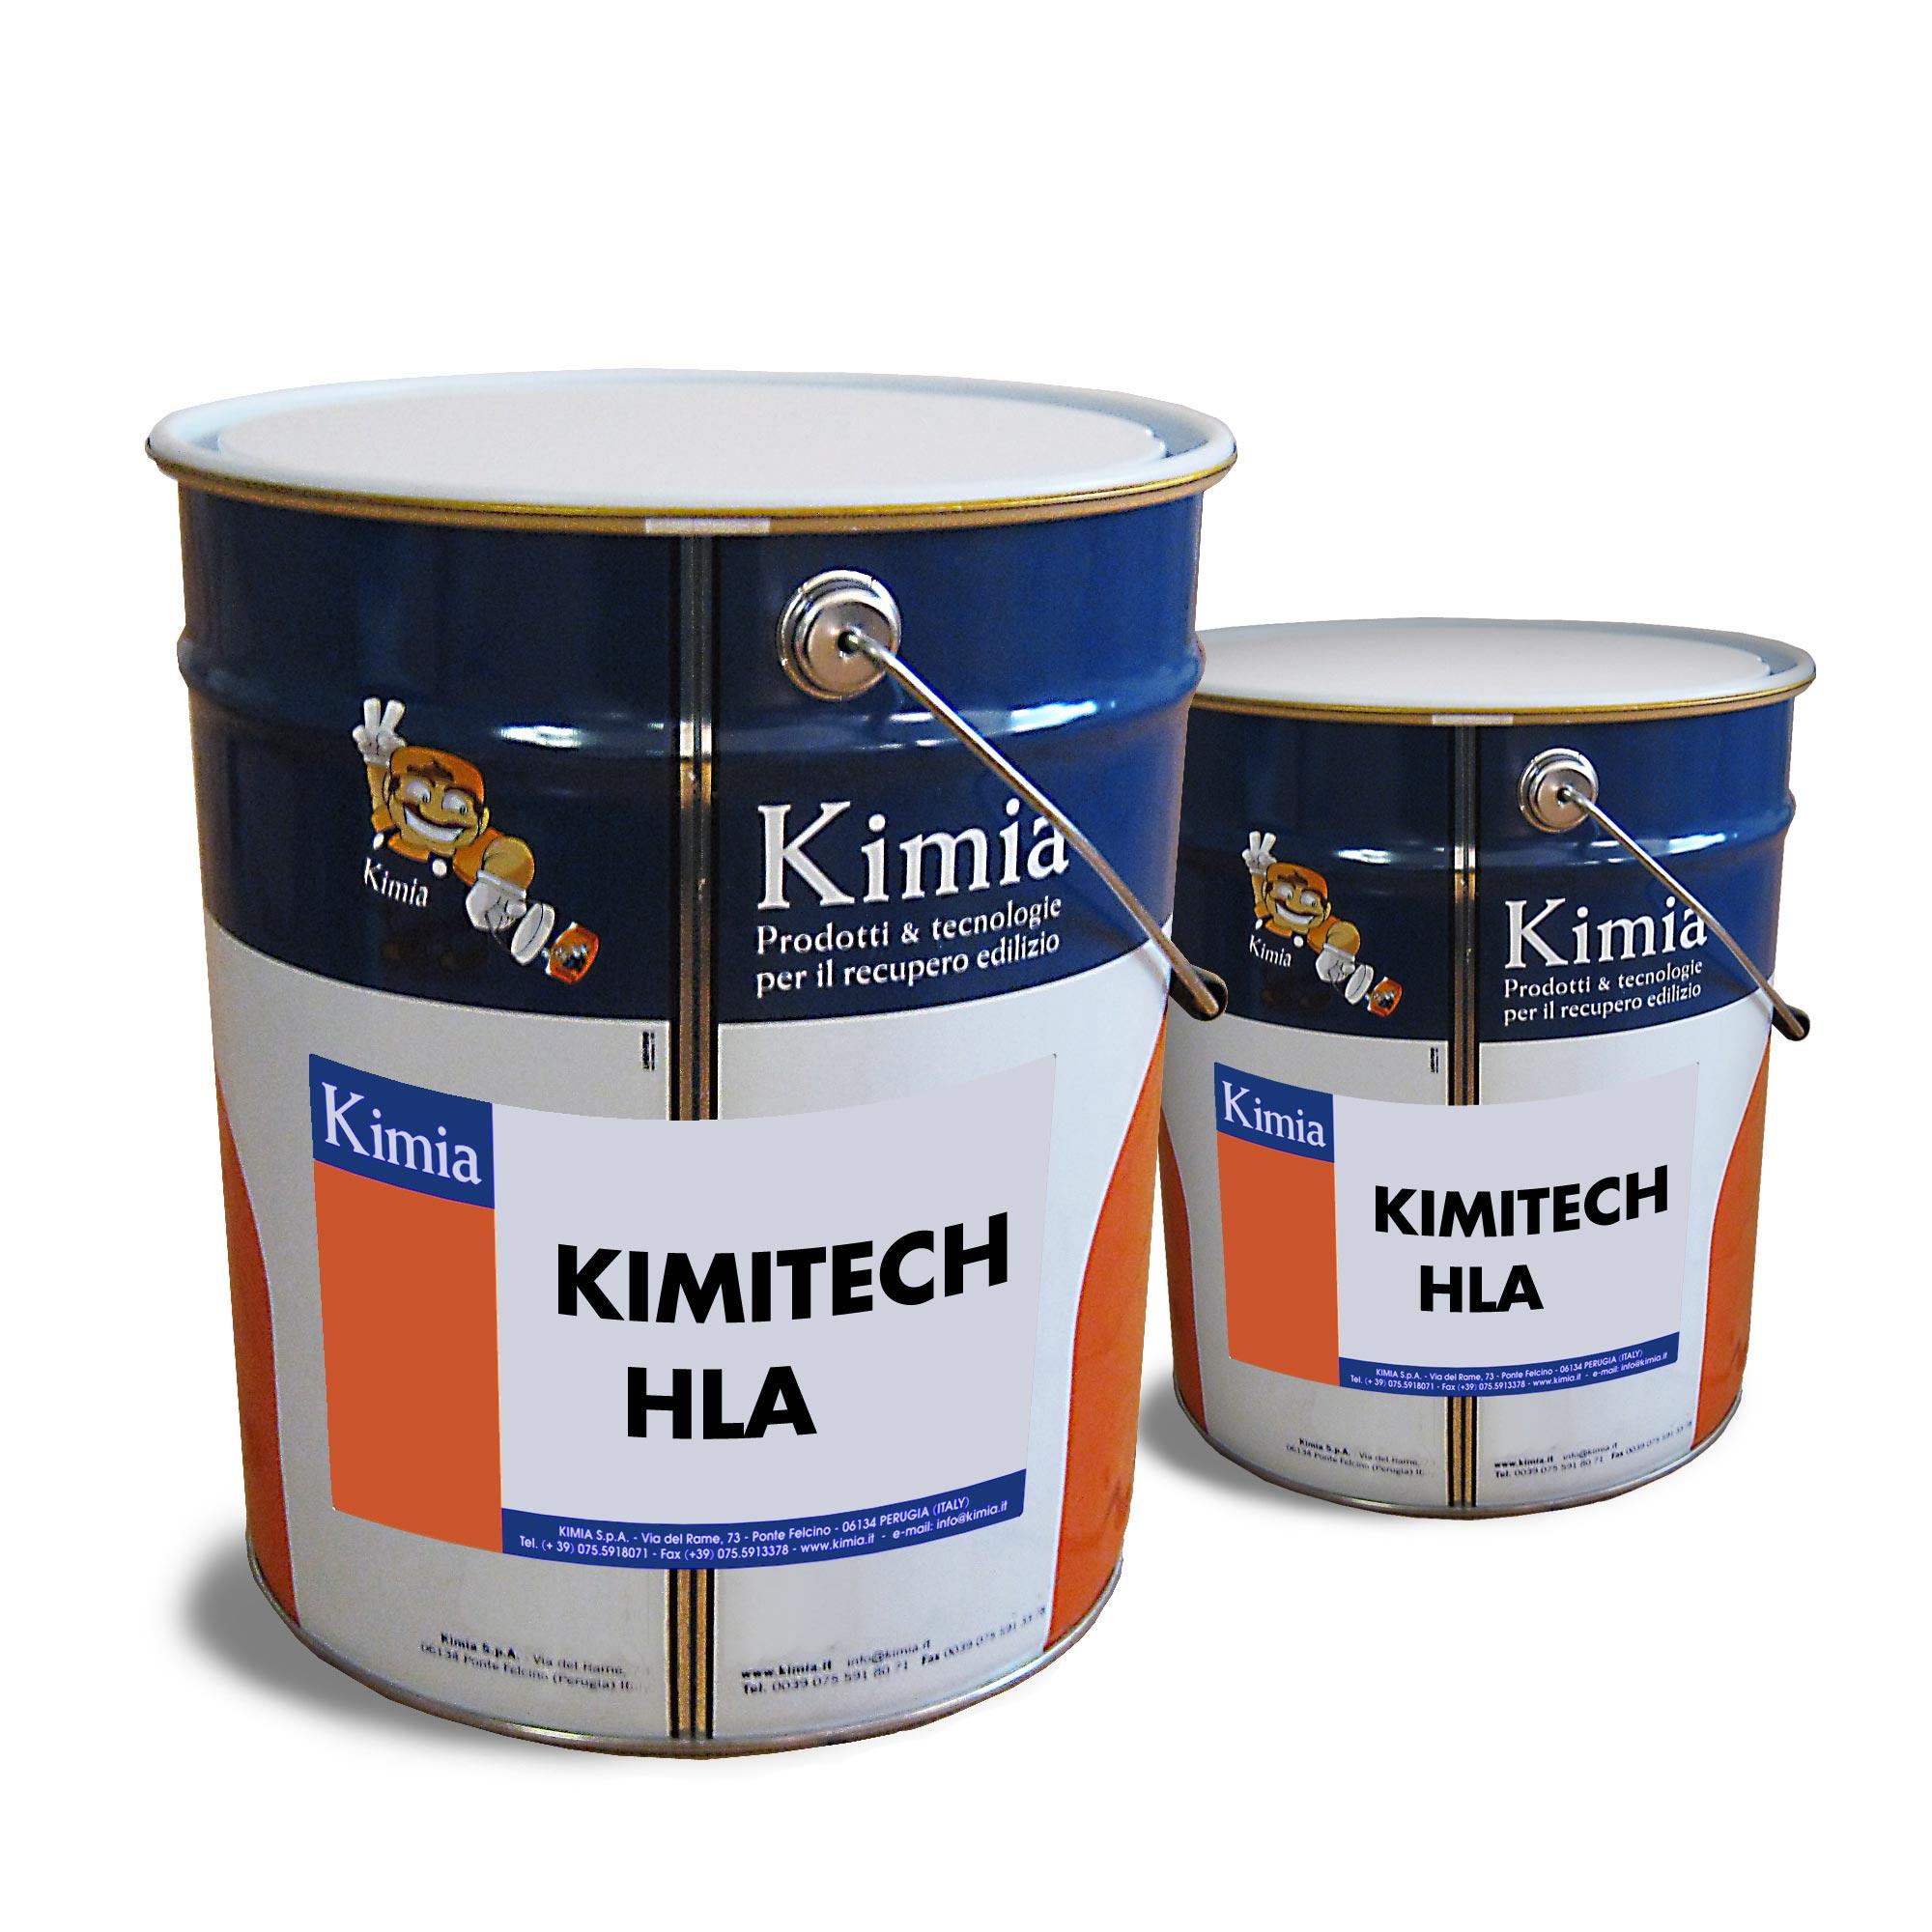 Kimitech HLA